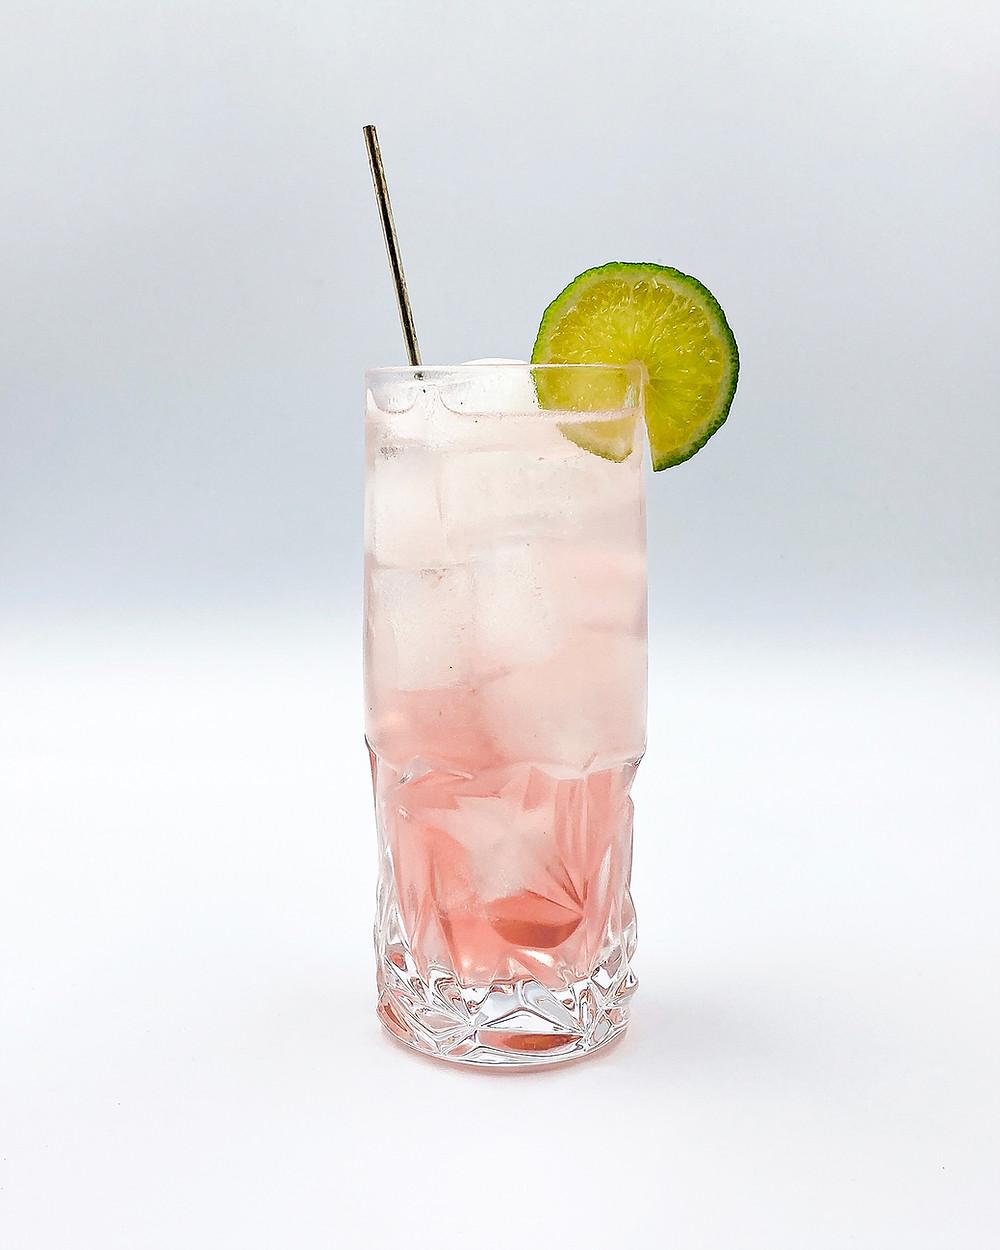 Gin Professors Rhubarb Rickey